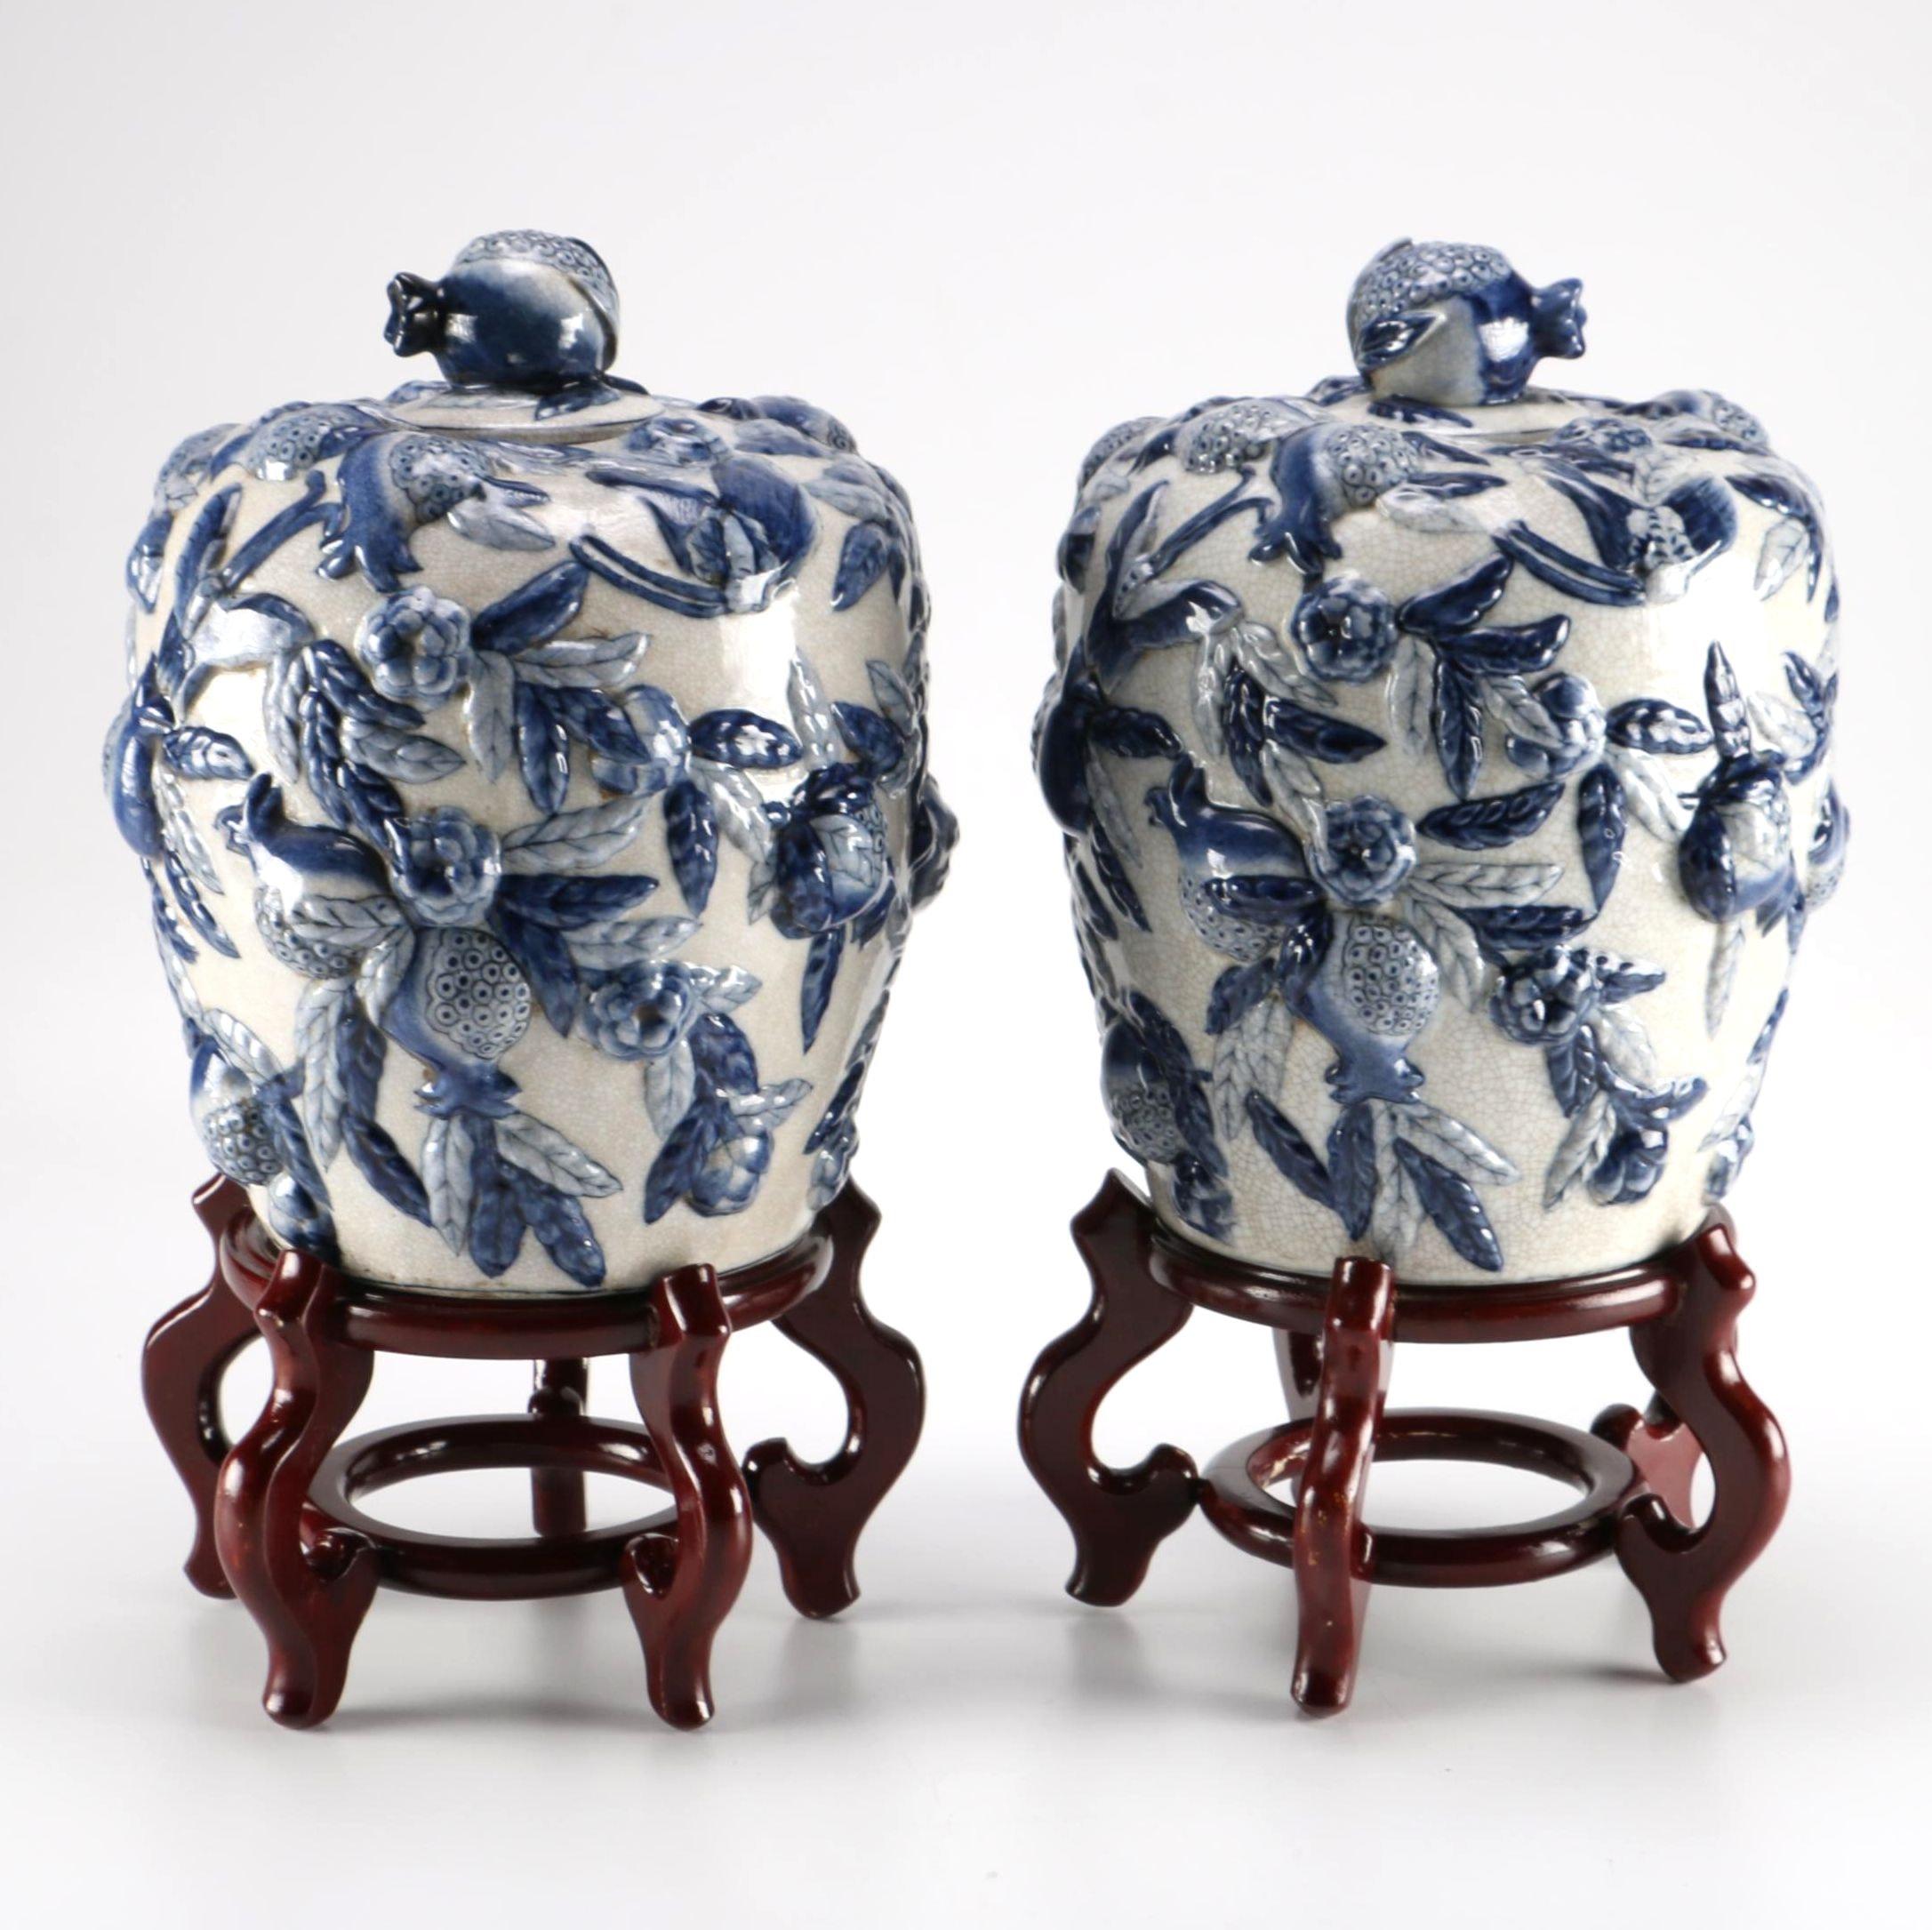 Chinese Decorative Ceramic Ginger Jars